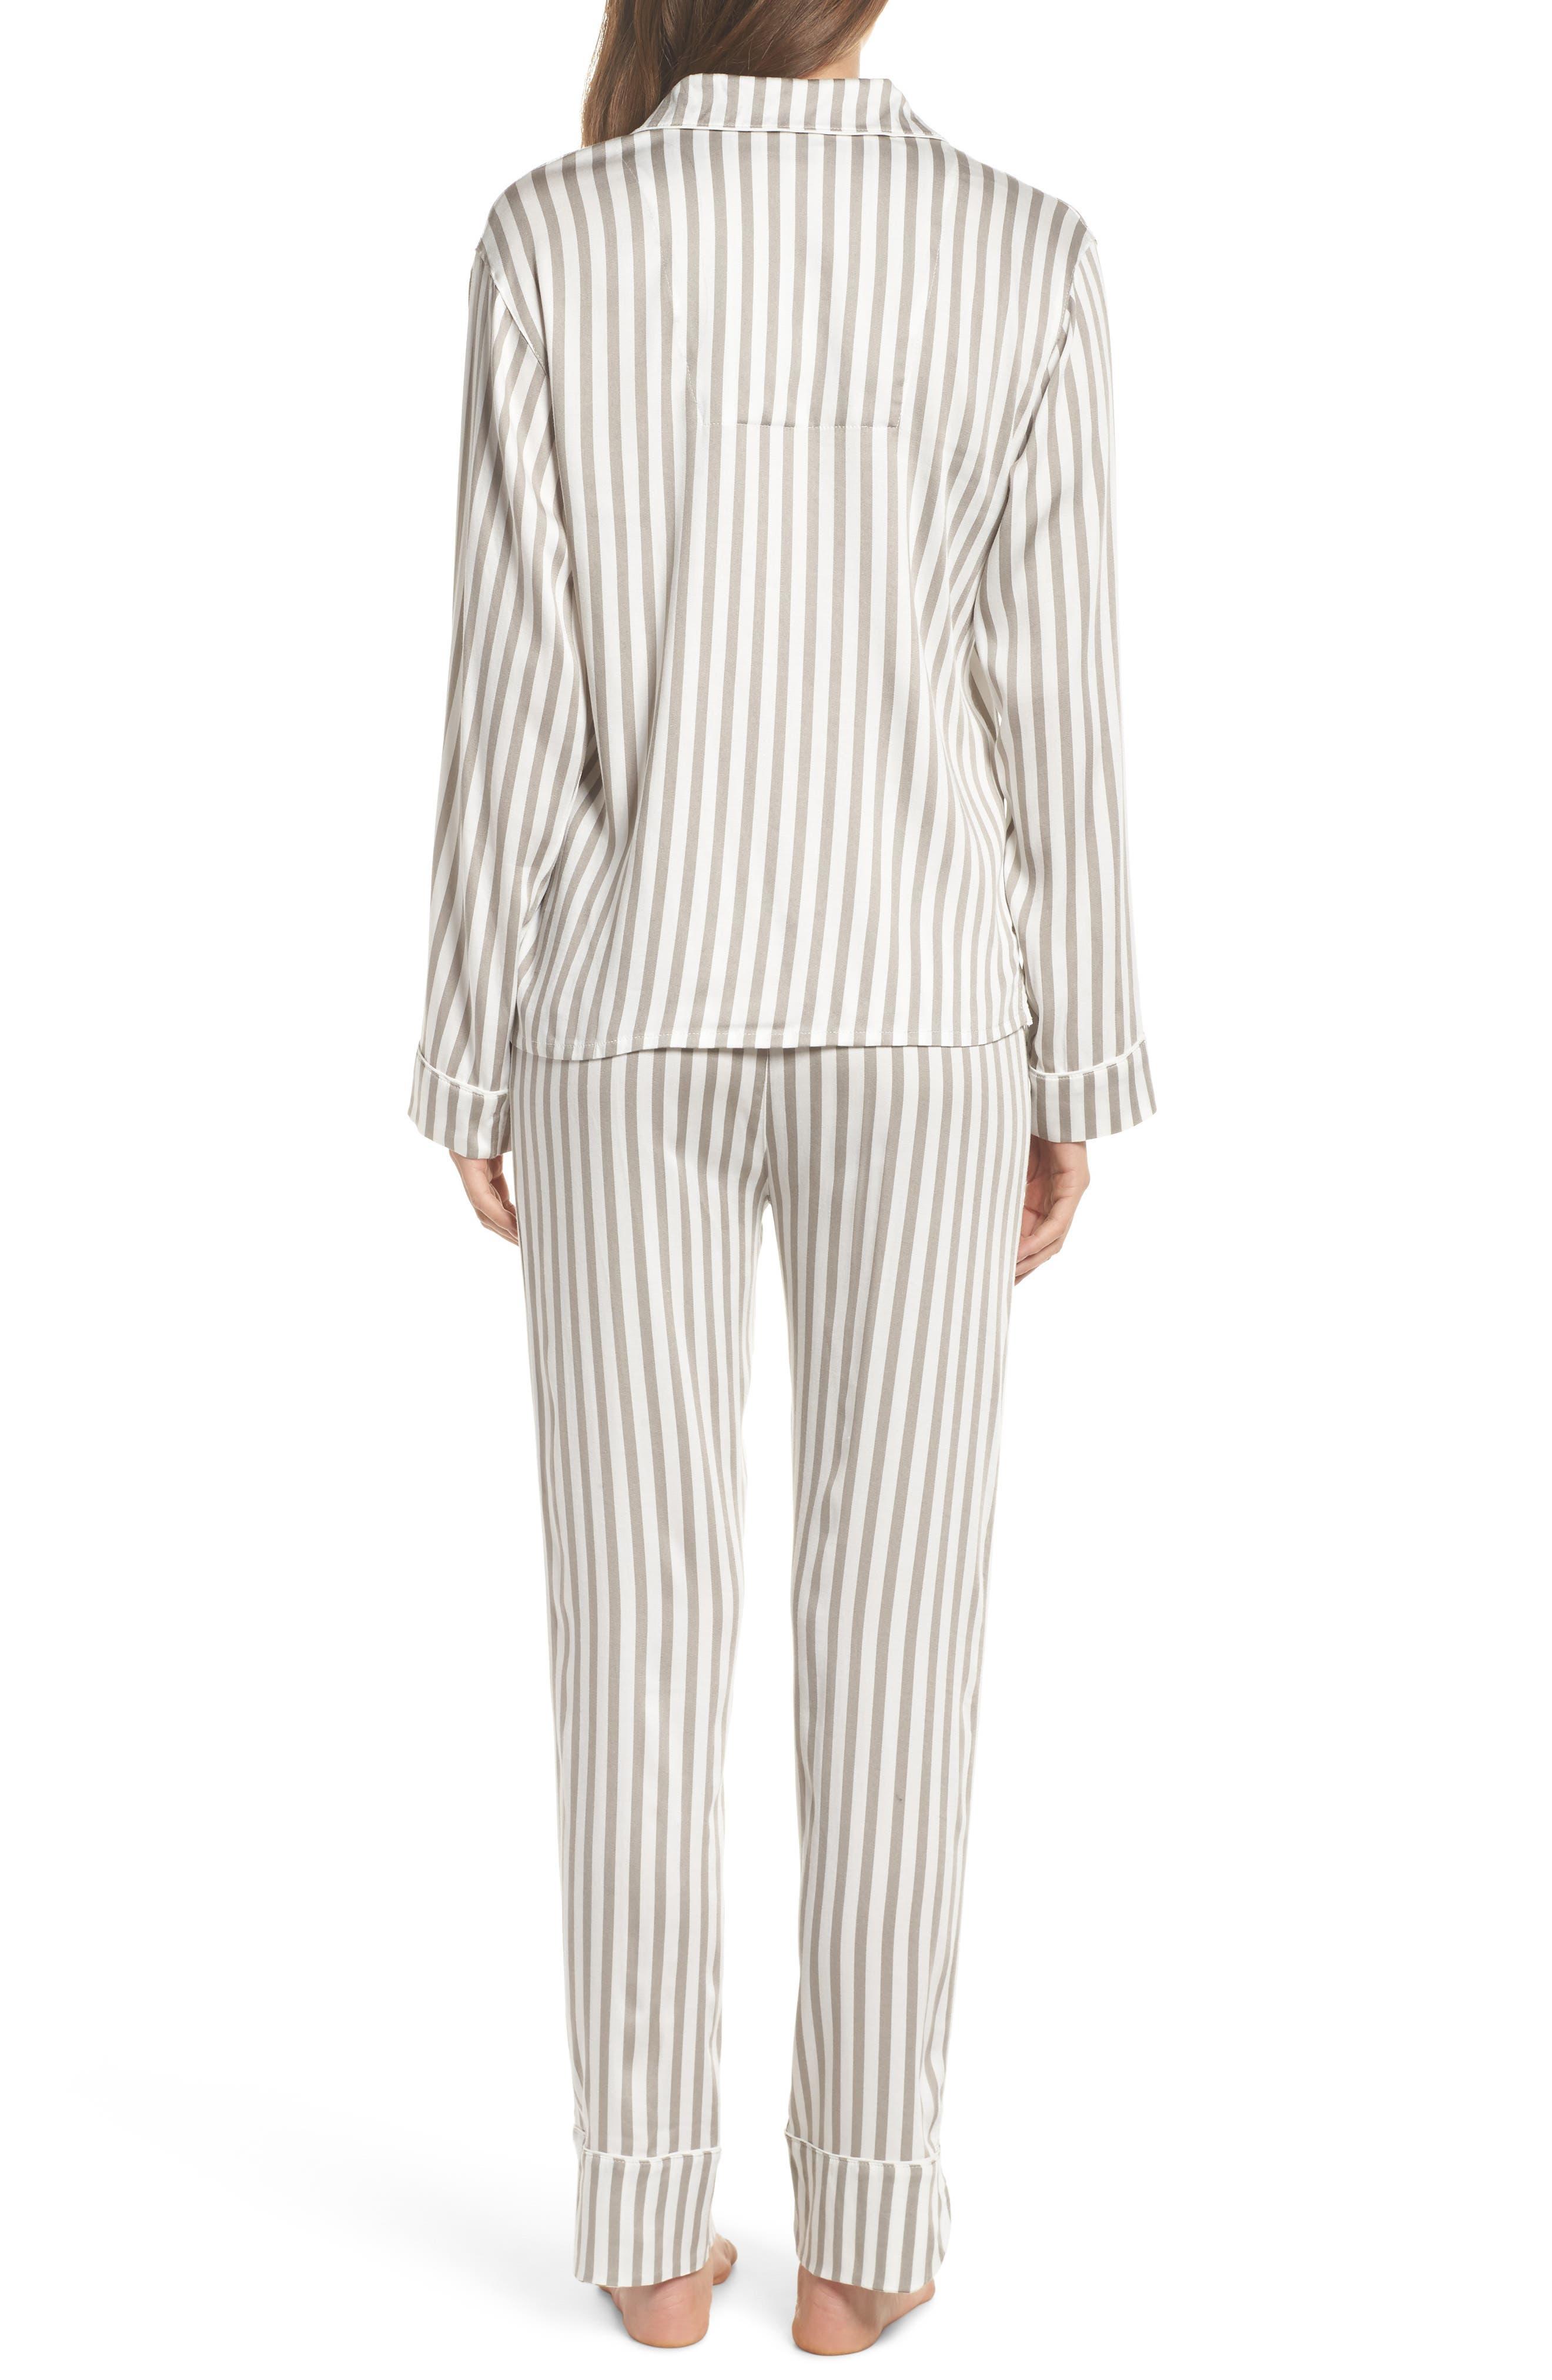 Stripe Pajamas,                             Alternate thumbnail 2, color,                             Silver